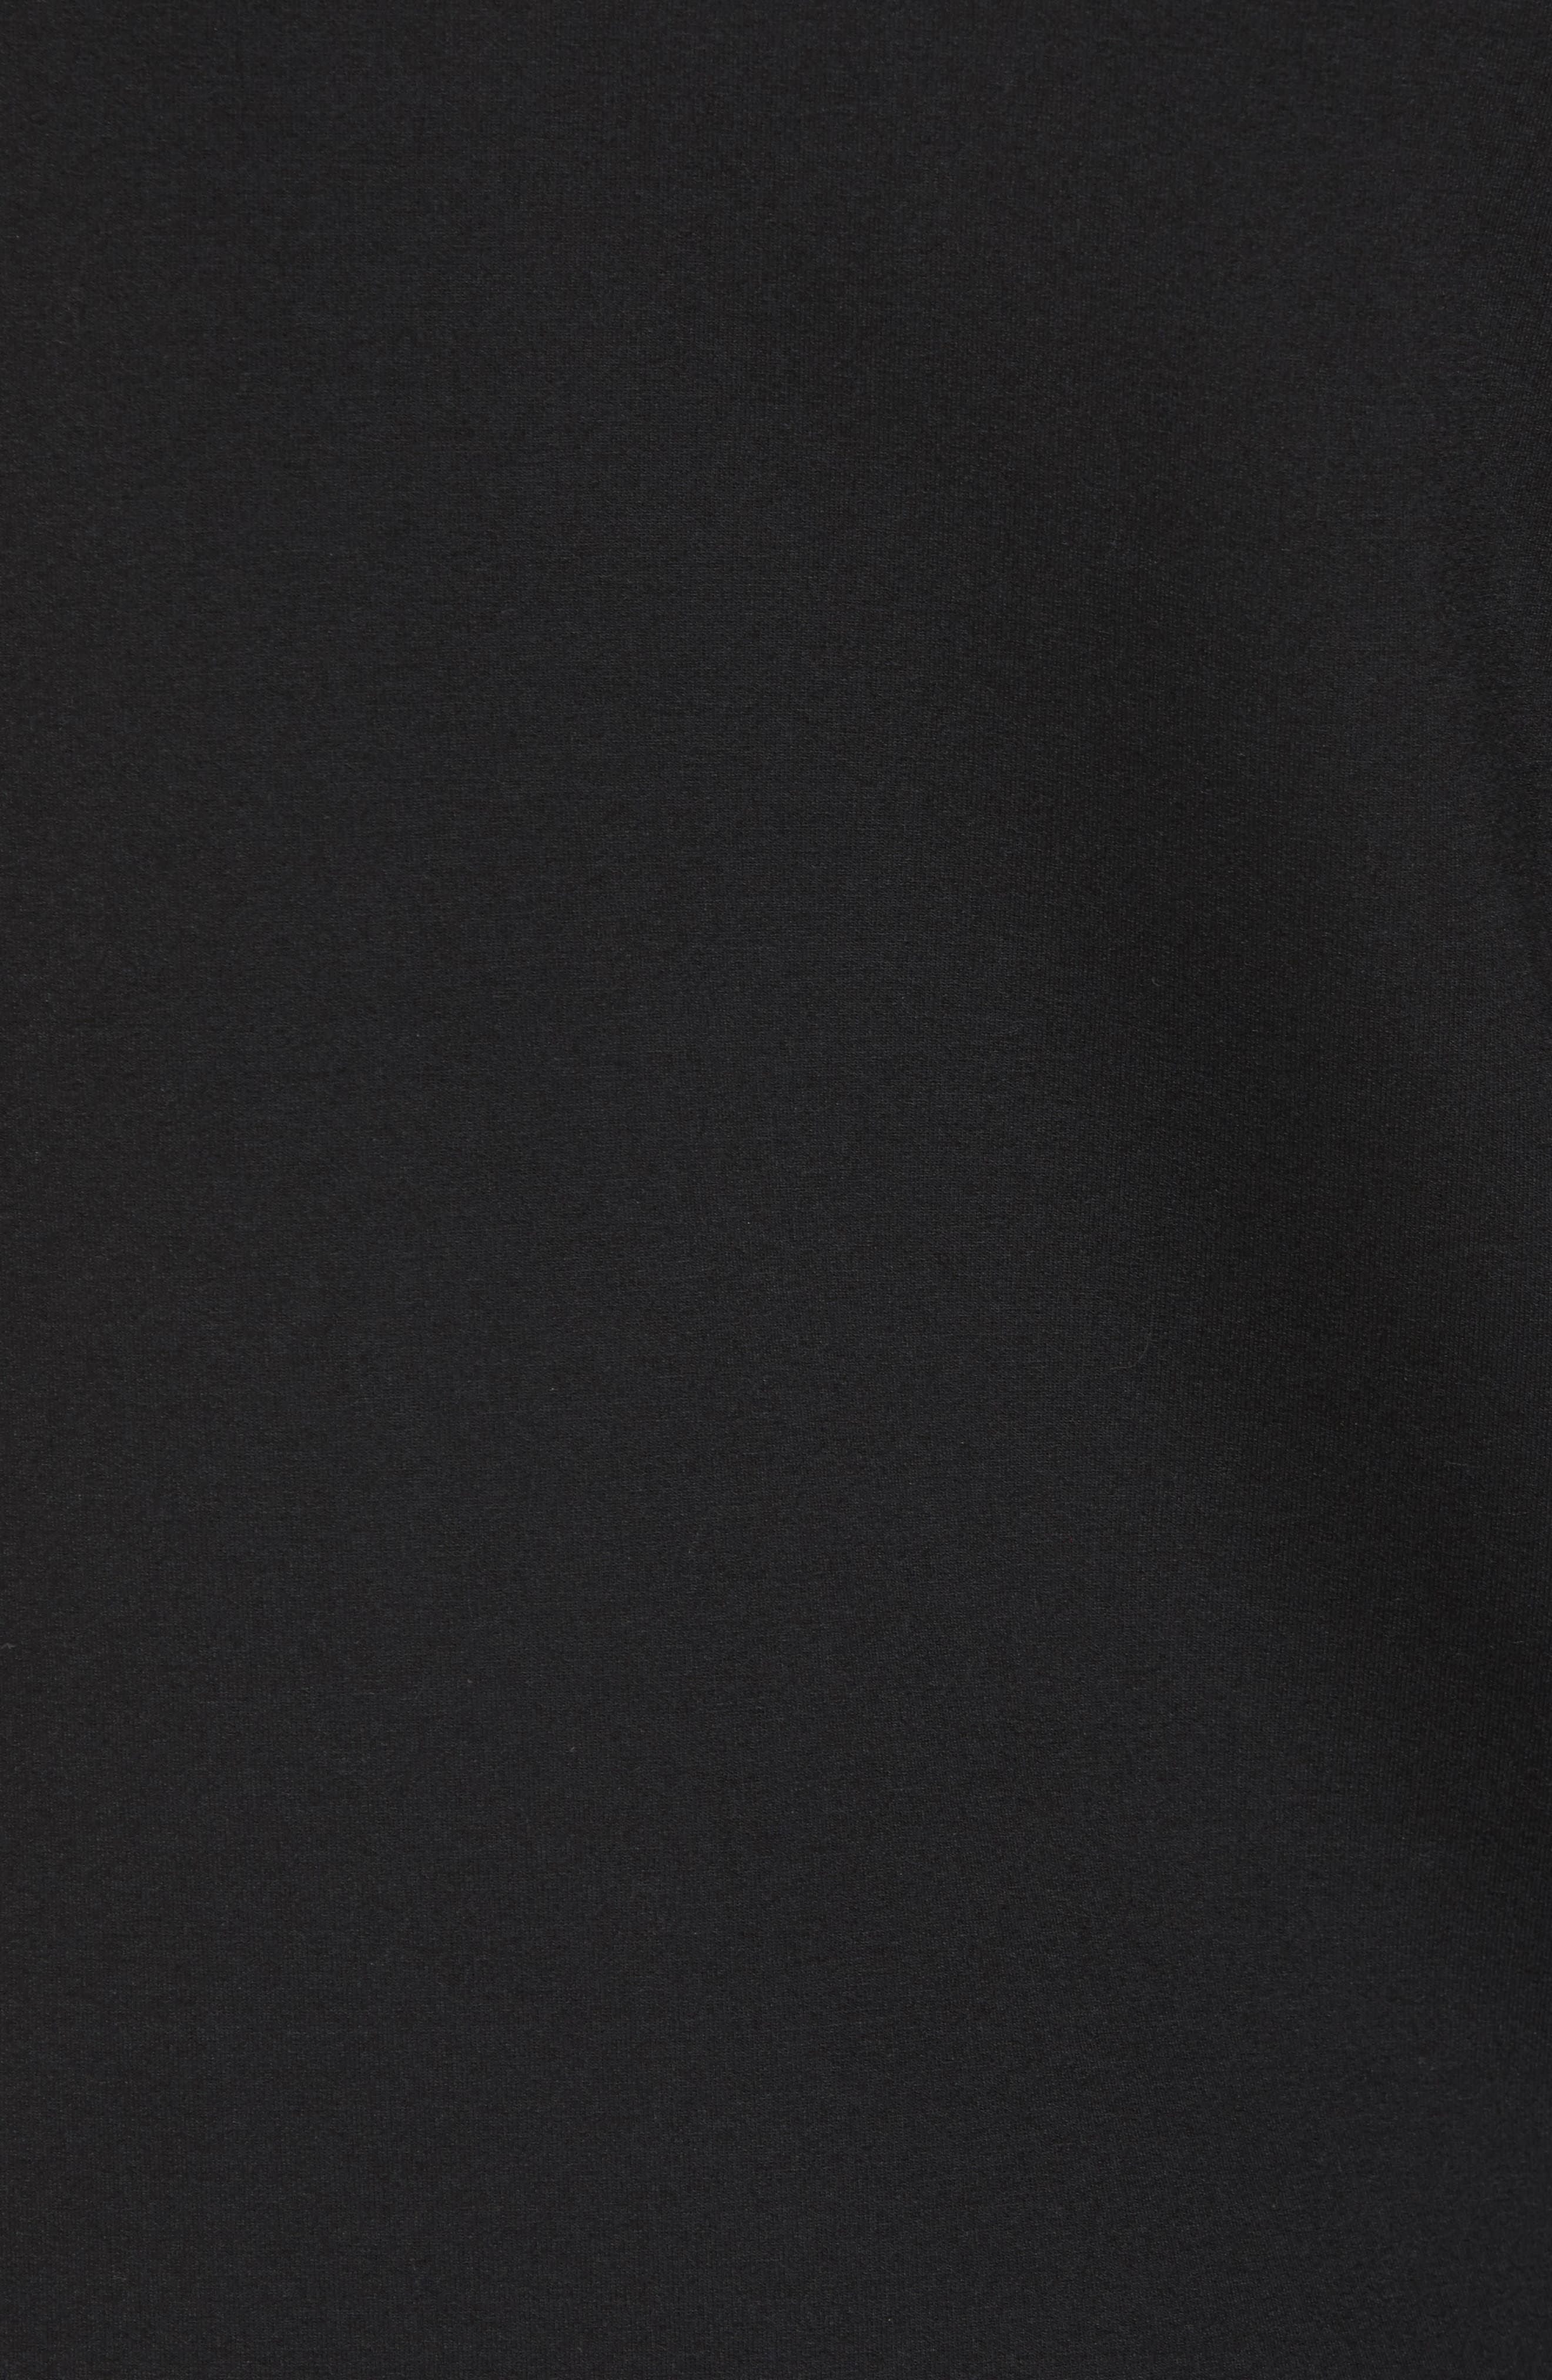 Hooded Fleece Jacket,                             Alternate thumbnail 5, color,                             Black